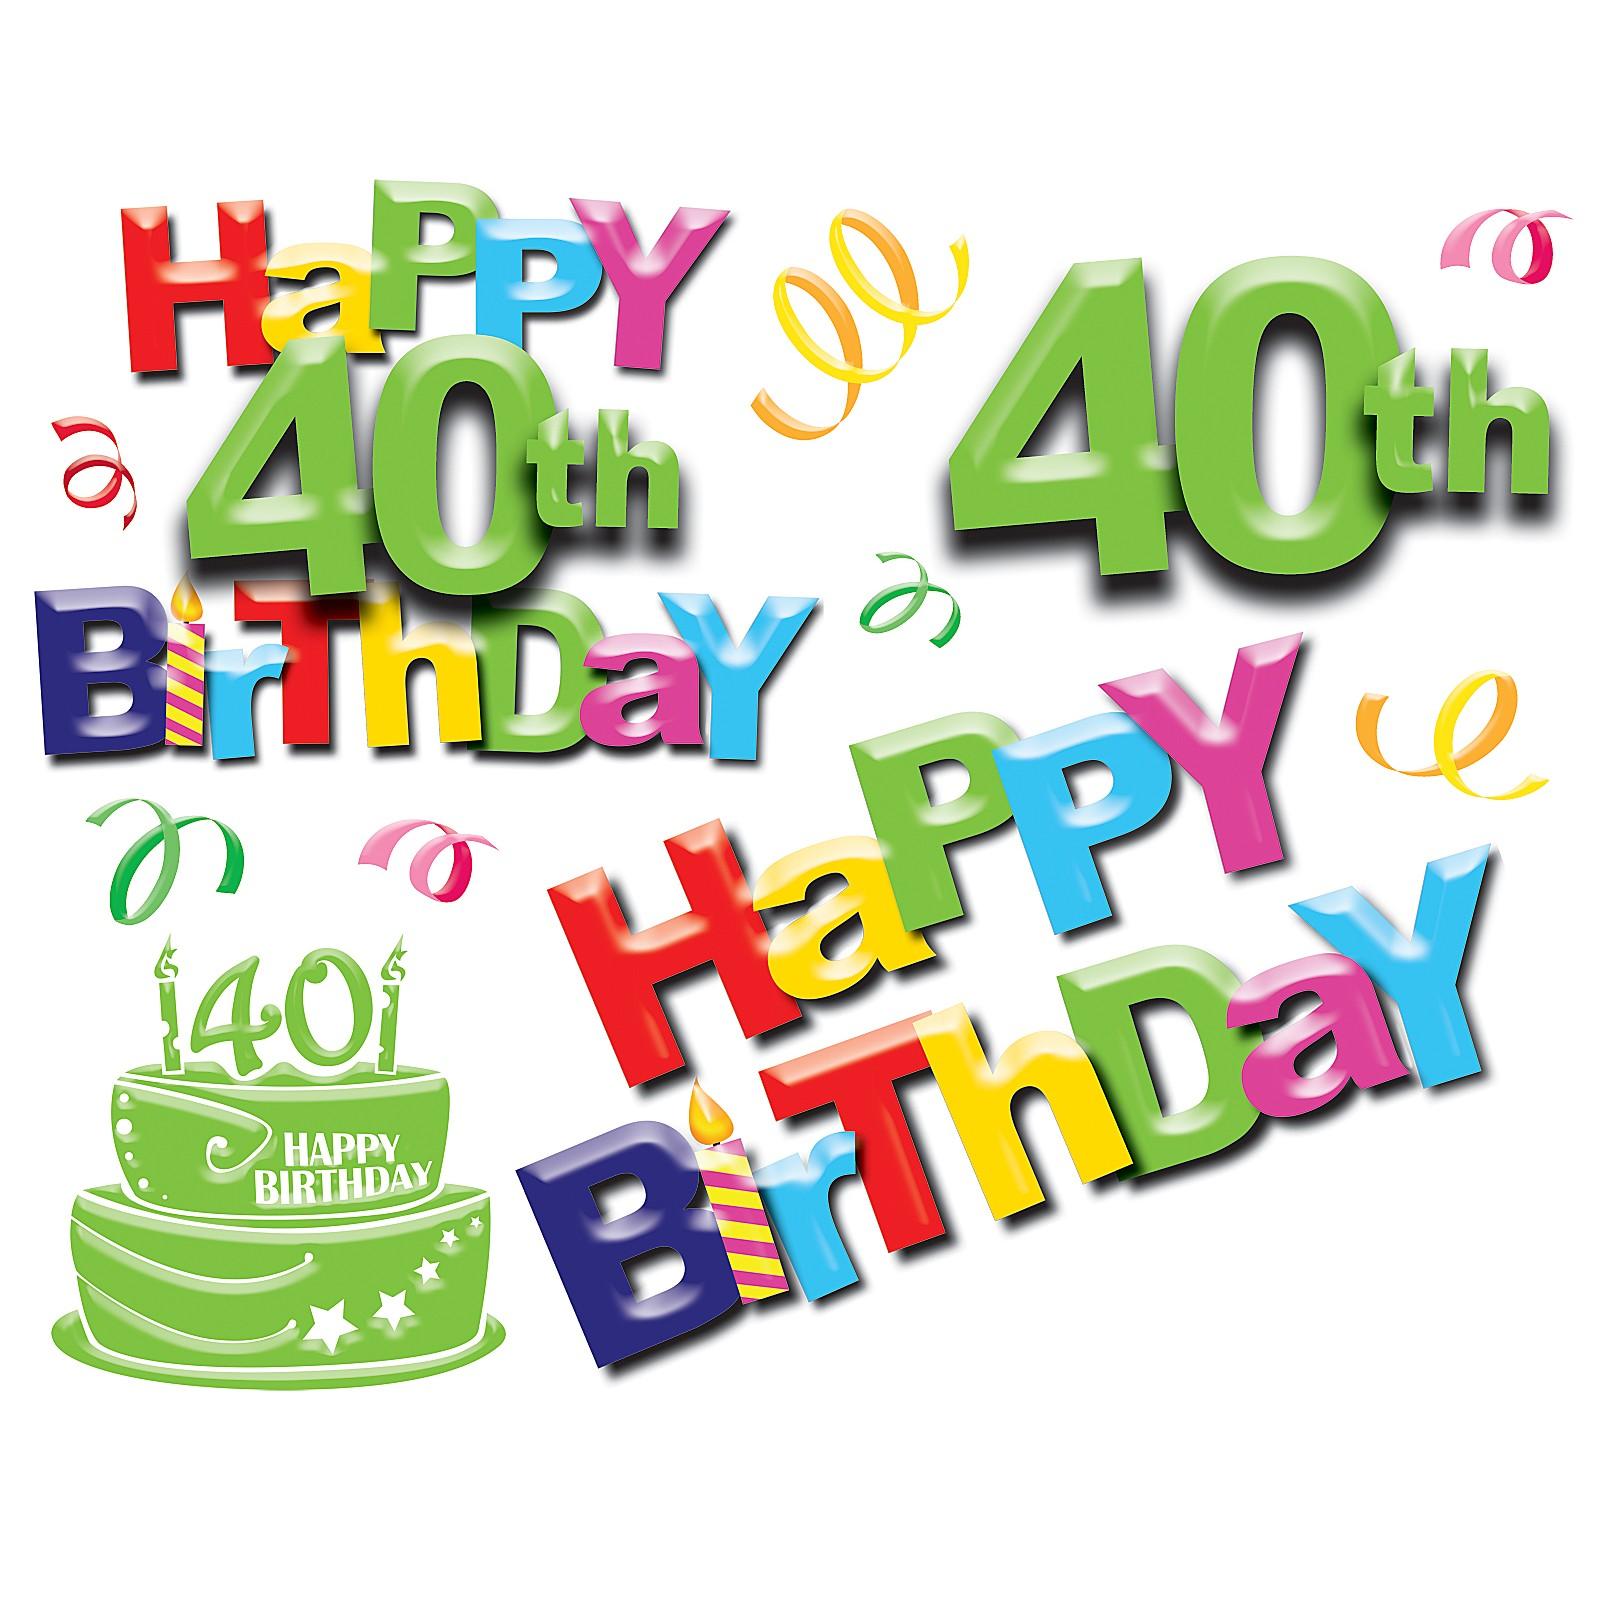 1600x1600 Free Funny 40th Birthday Clipart